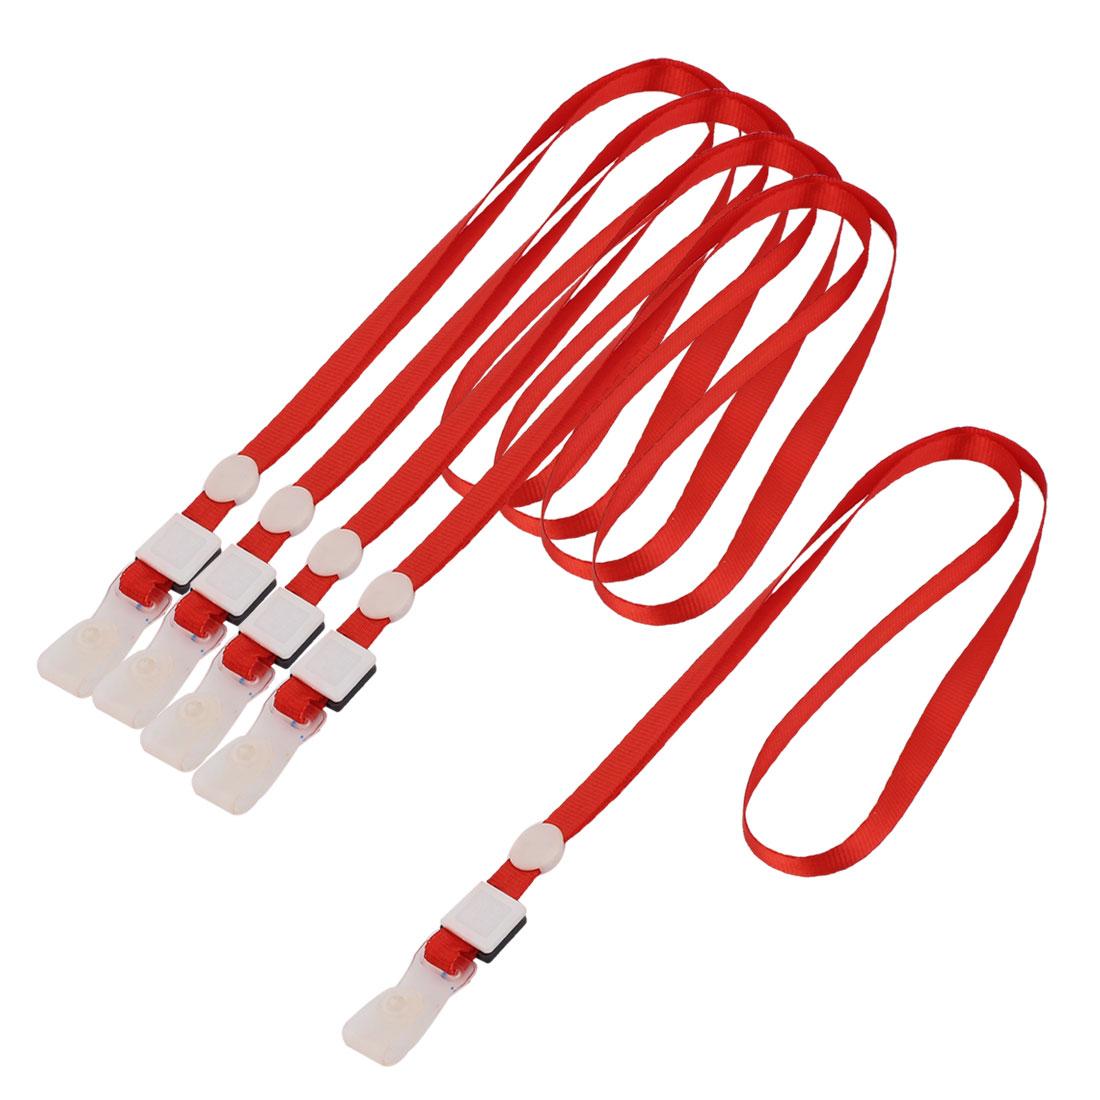 Staff ID Name Card Pass Badge Holder Neck Strap String Lanyard Red 5pcs